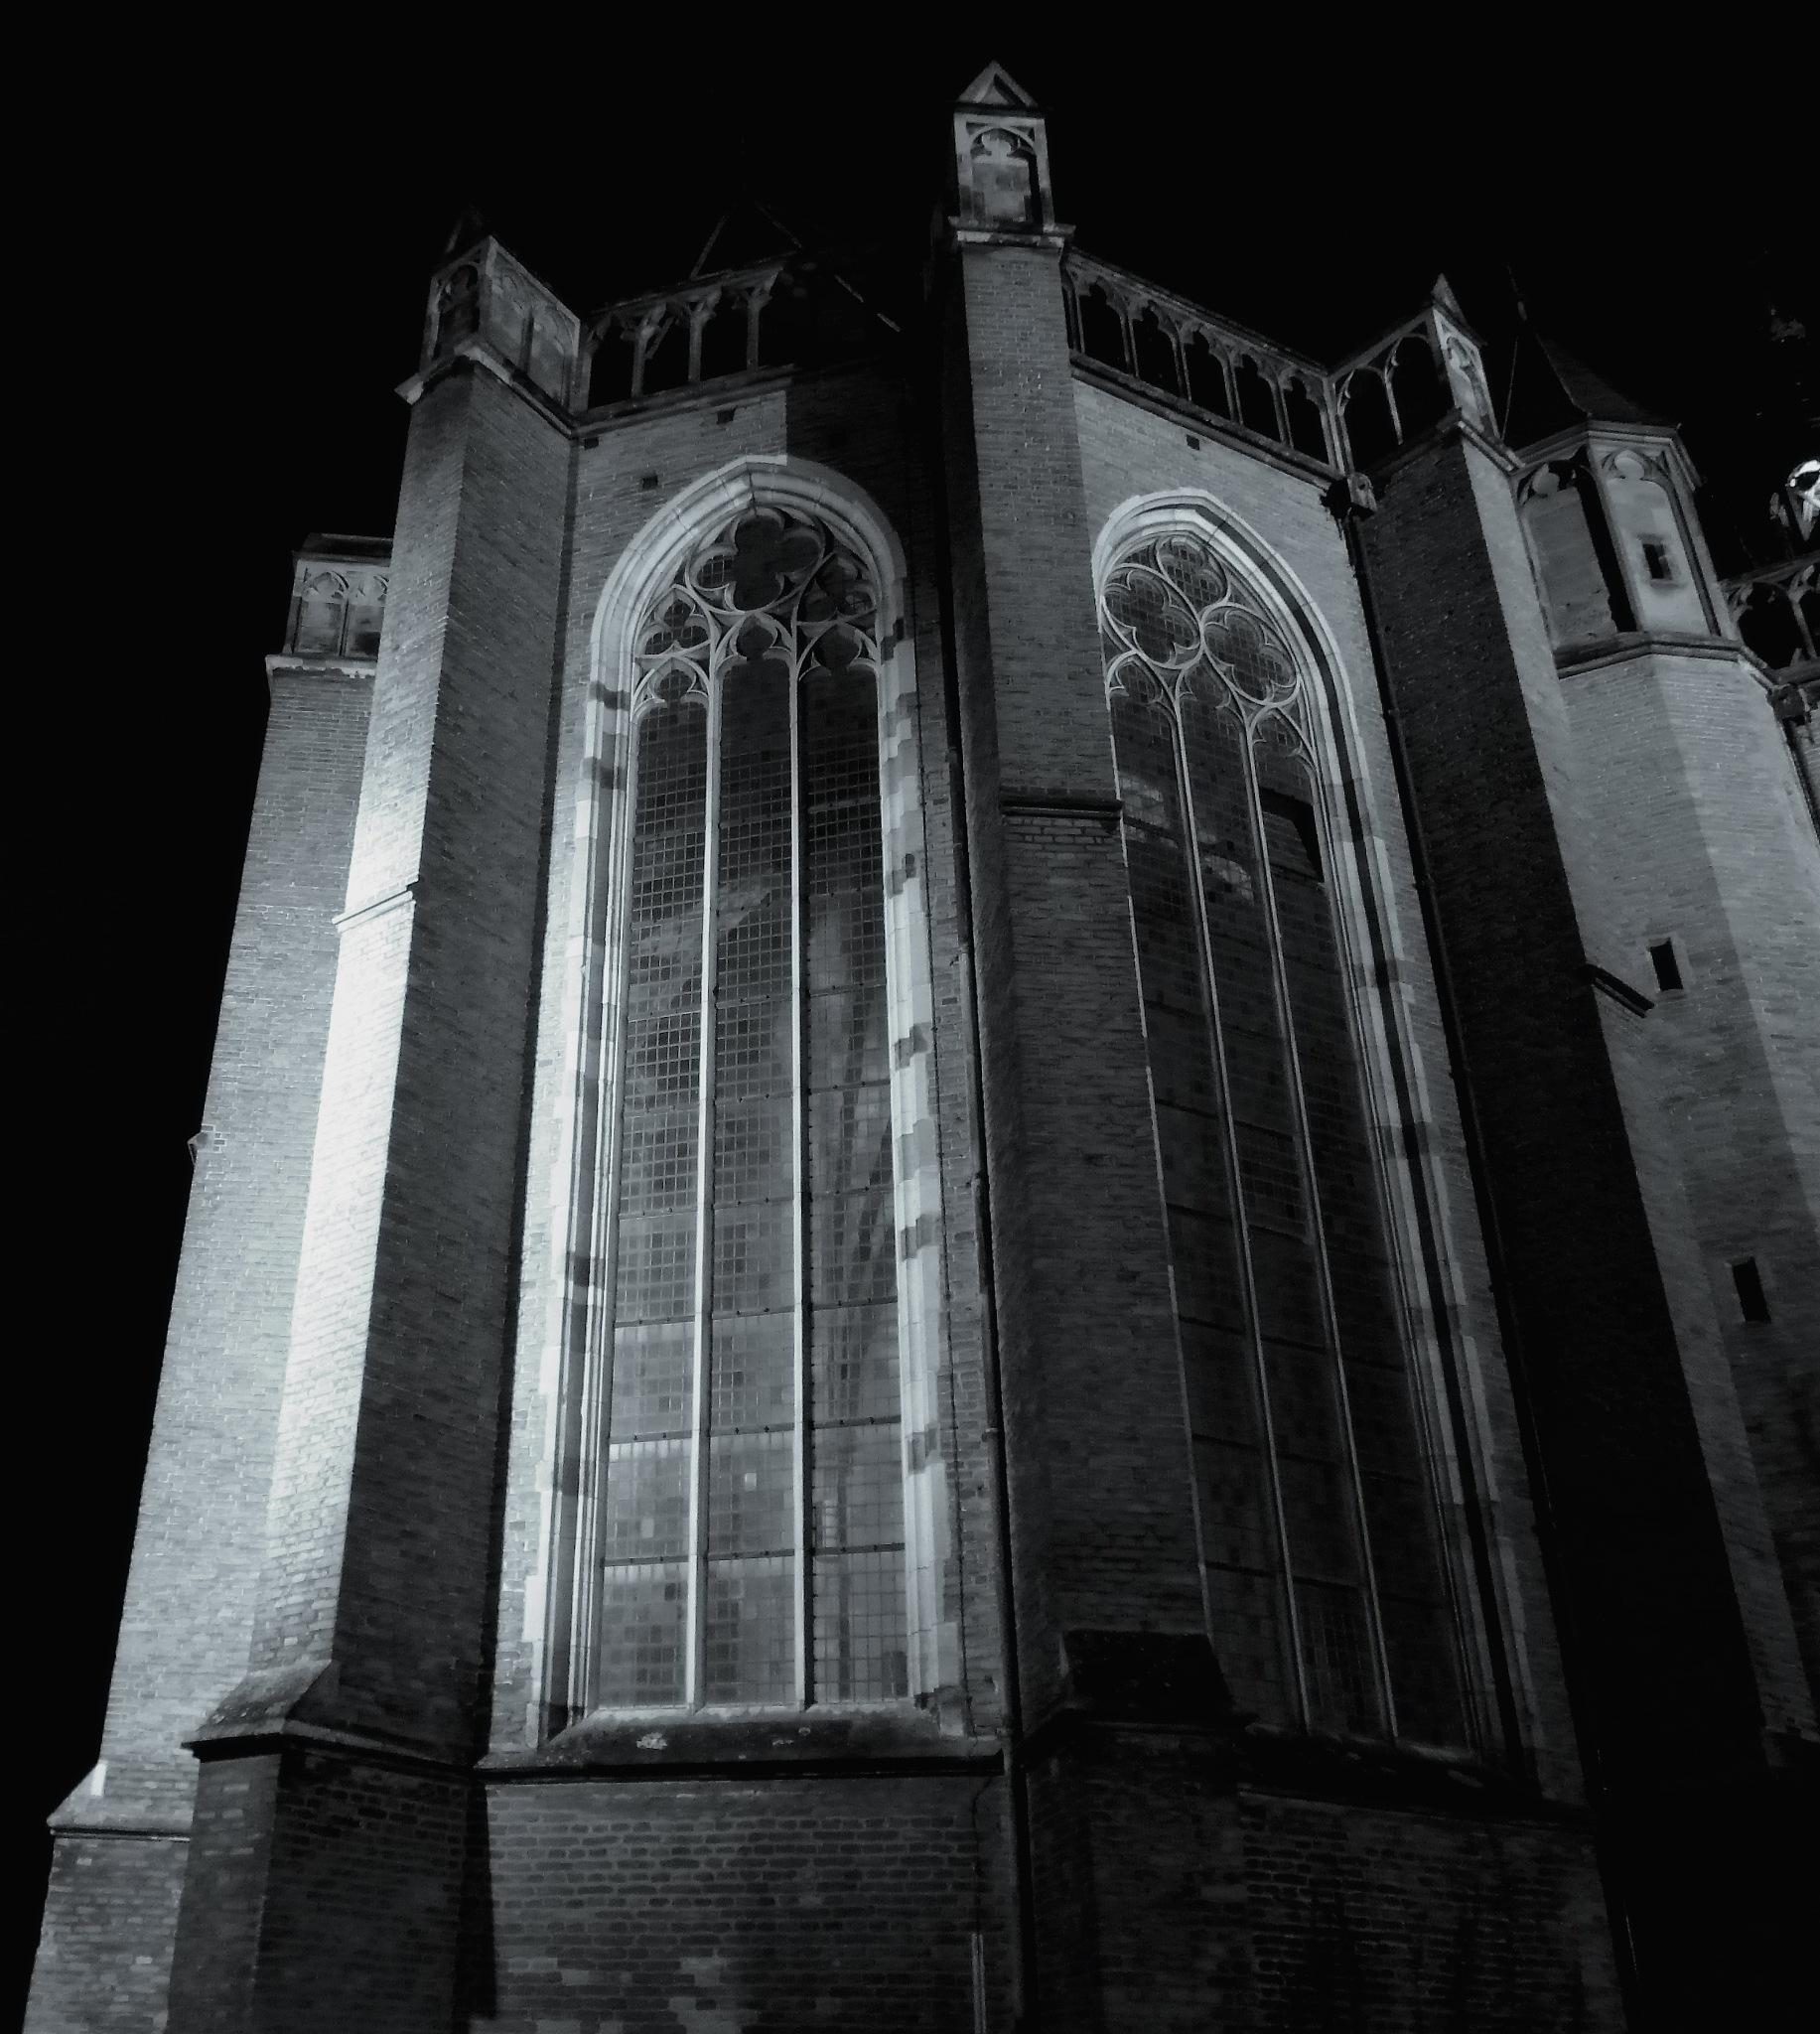 St. Walburgischurch Zutphen The Netherlands by Ber te Mebel